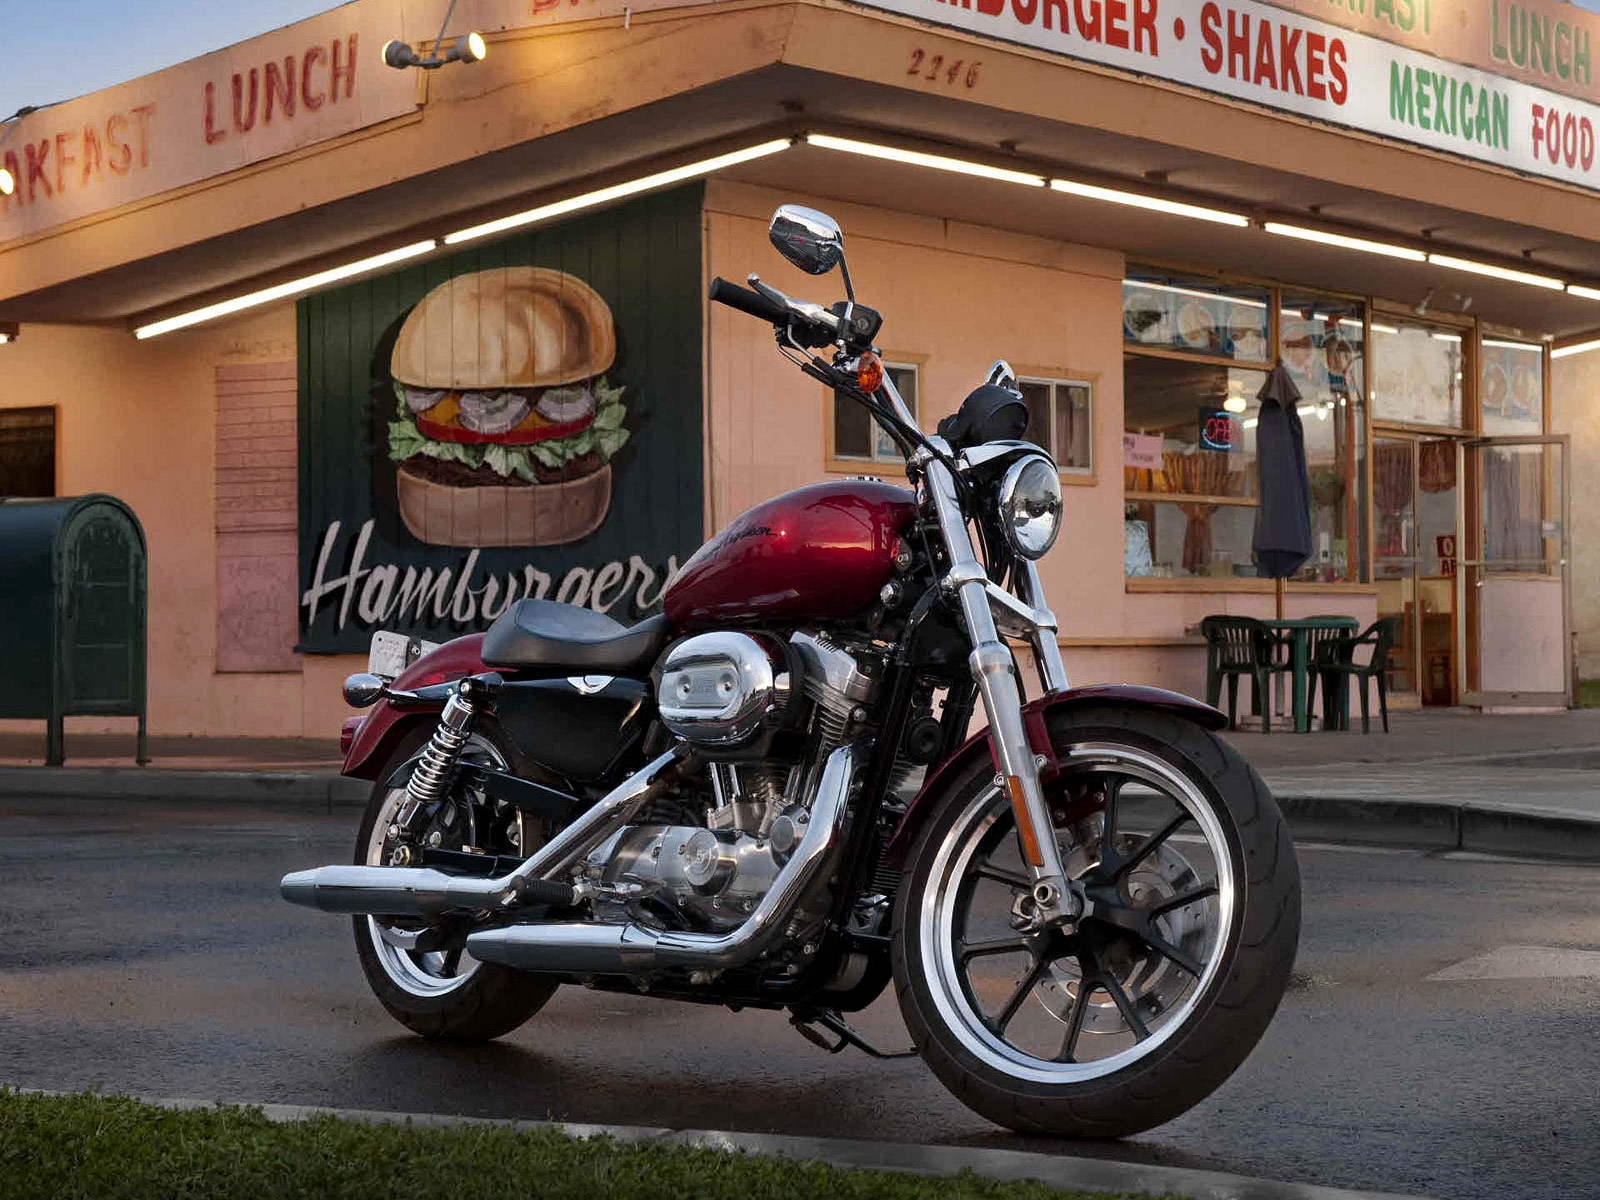 Honda Dealers In Ri >> 2012 Harley-Davidson XL883L Sportster 883 SuperLow